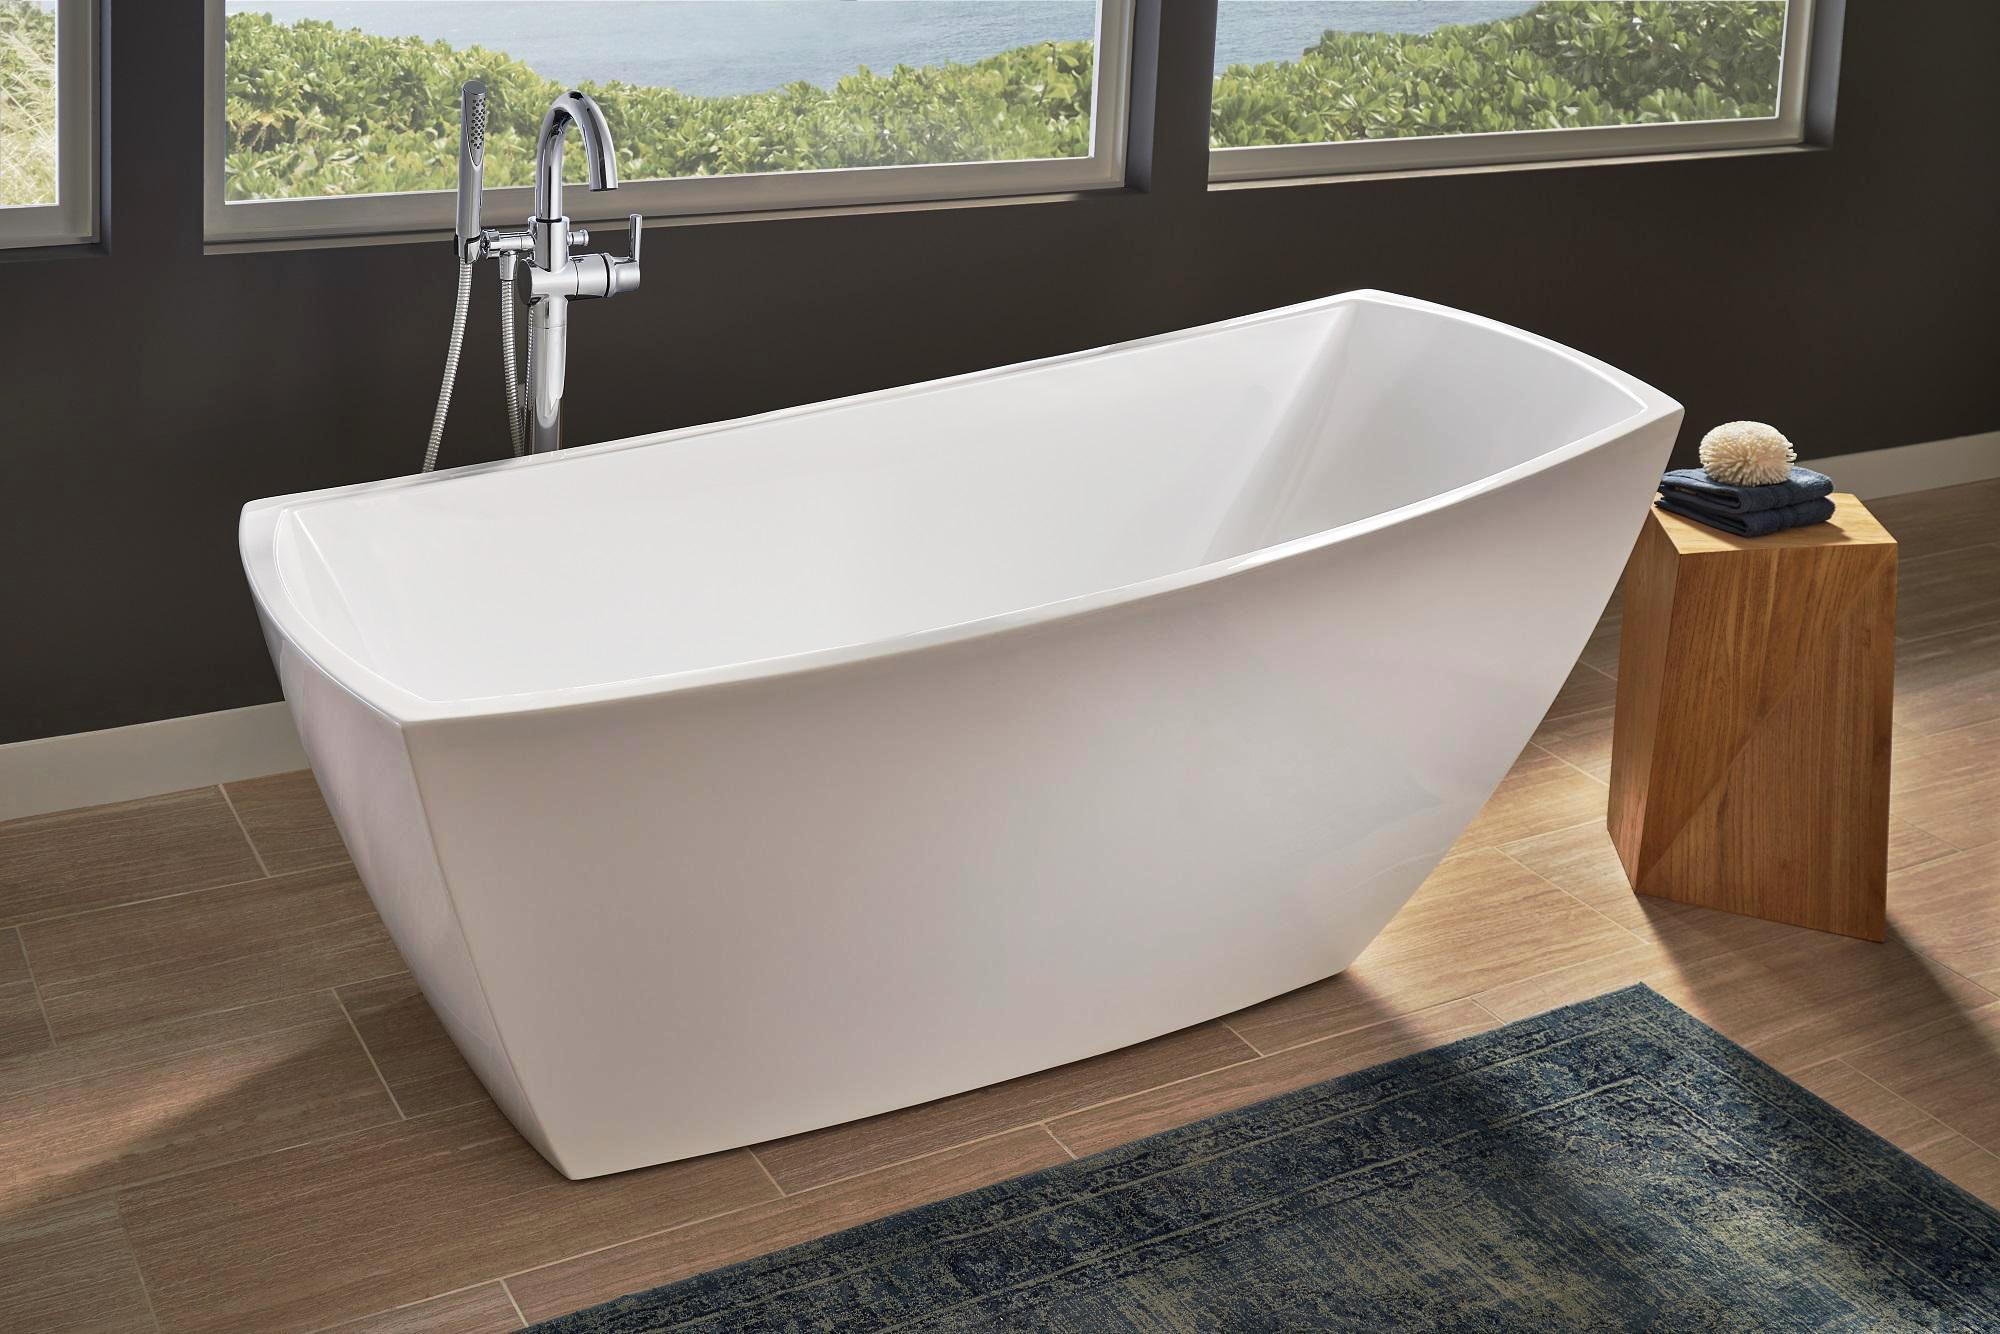 Freestanding Soaking Tub With Jets Schmidt Gallery Design